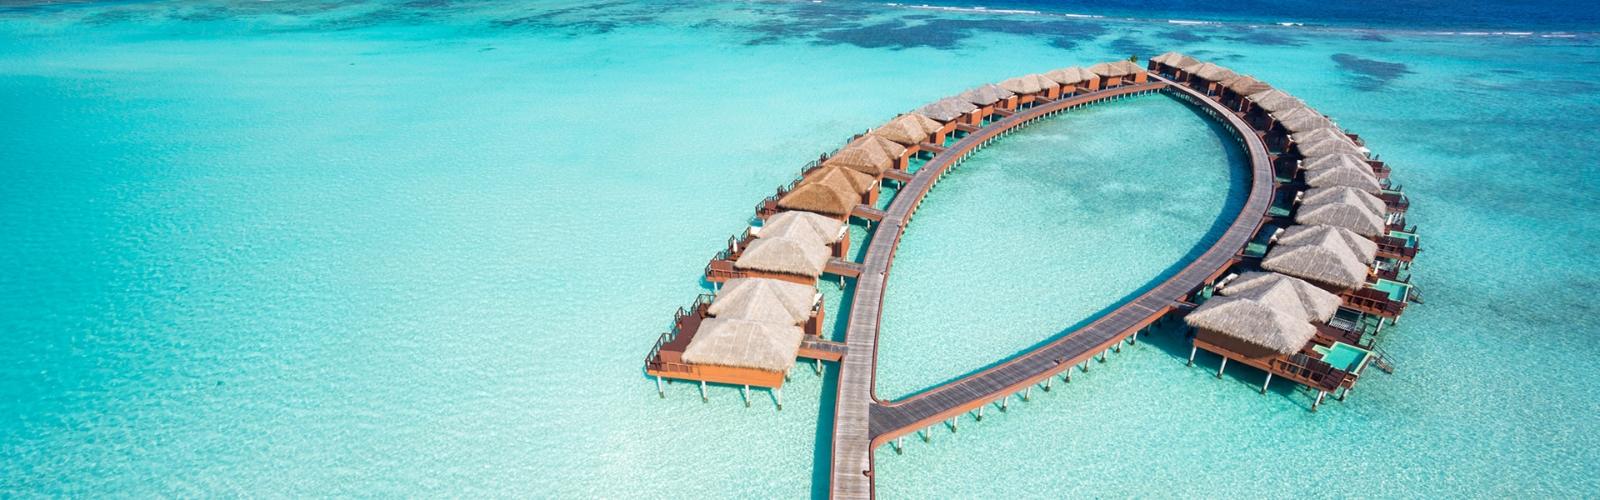 Holiday Destinations 2020 2021 Exotic Holiday Destinations Virgin Holidays